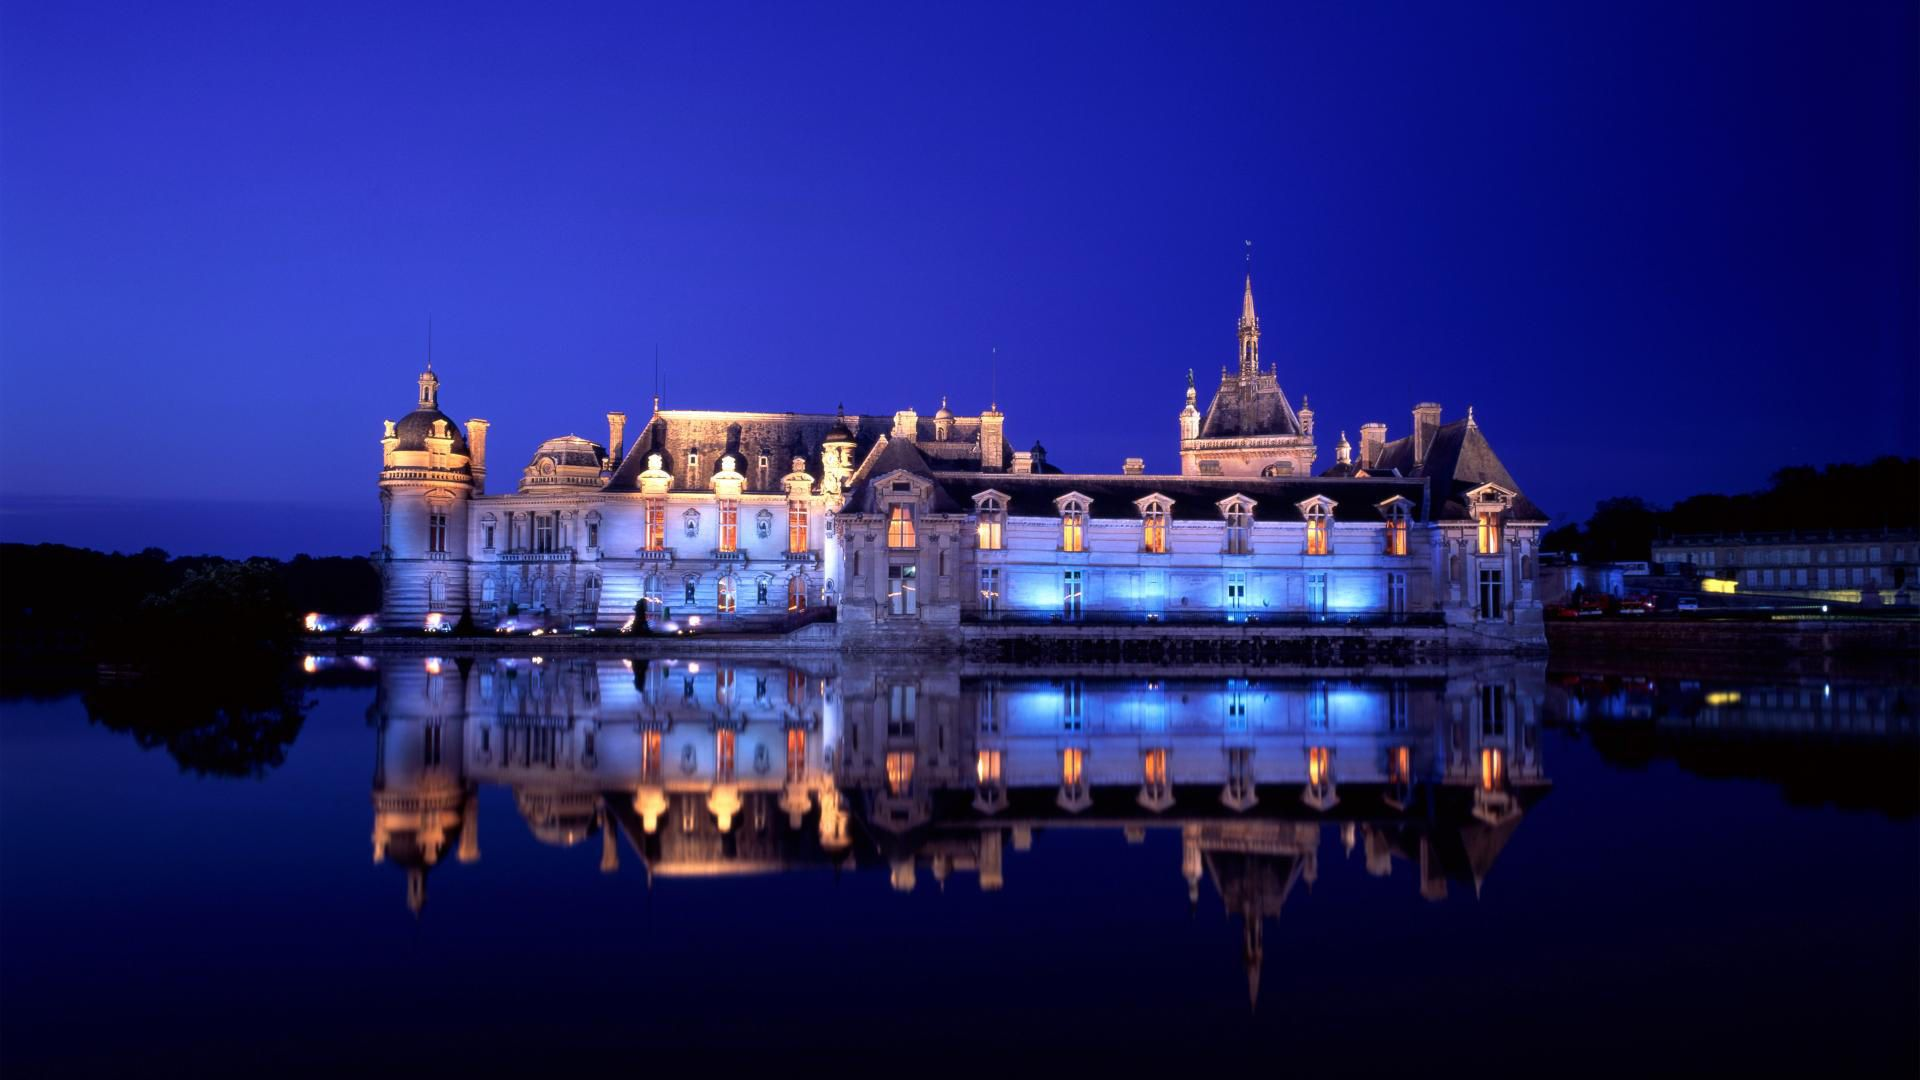 Chateau-de-Chantilly-Chantilly-France